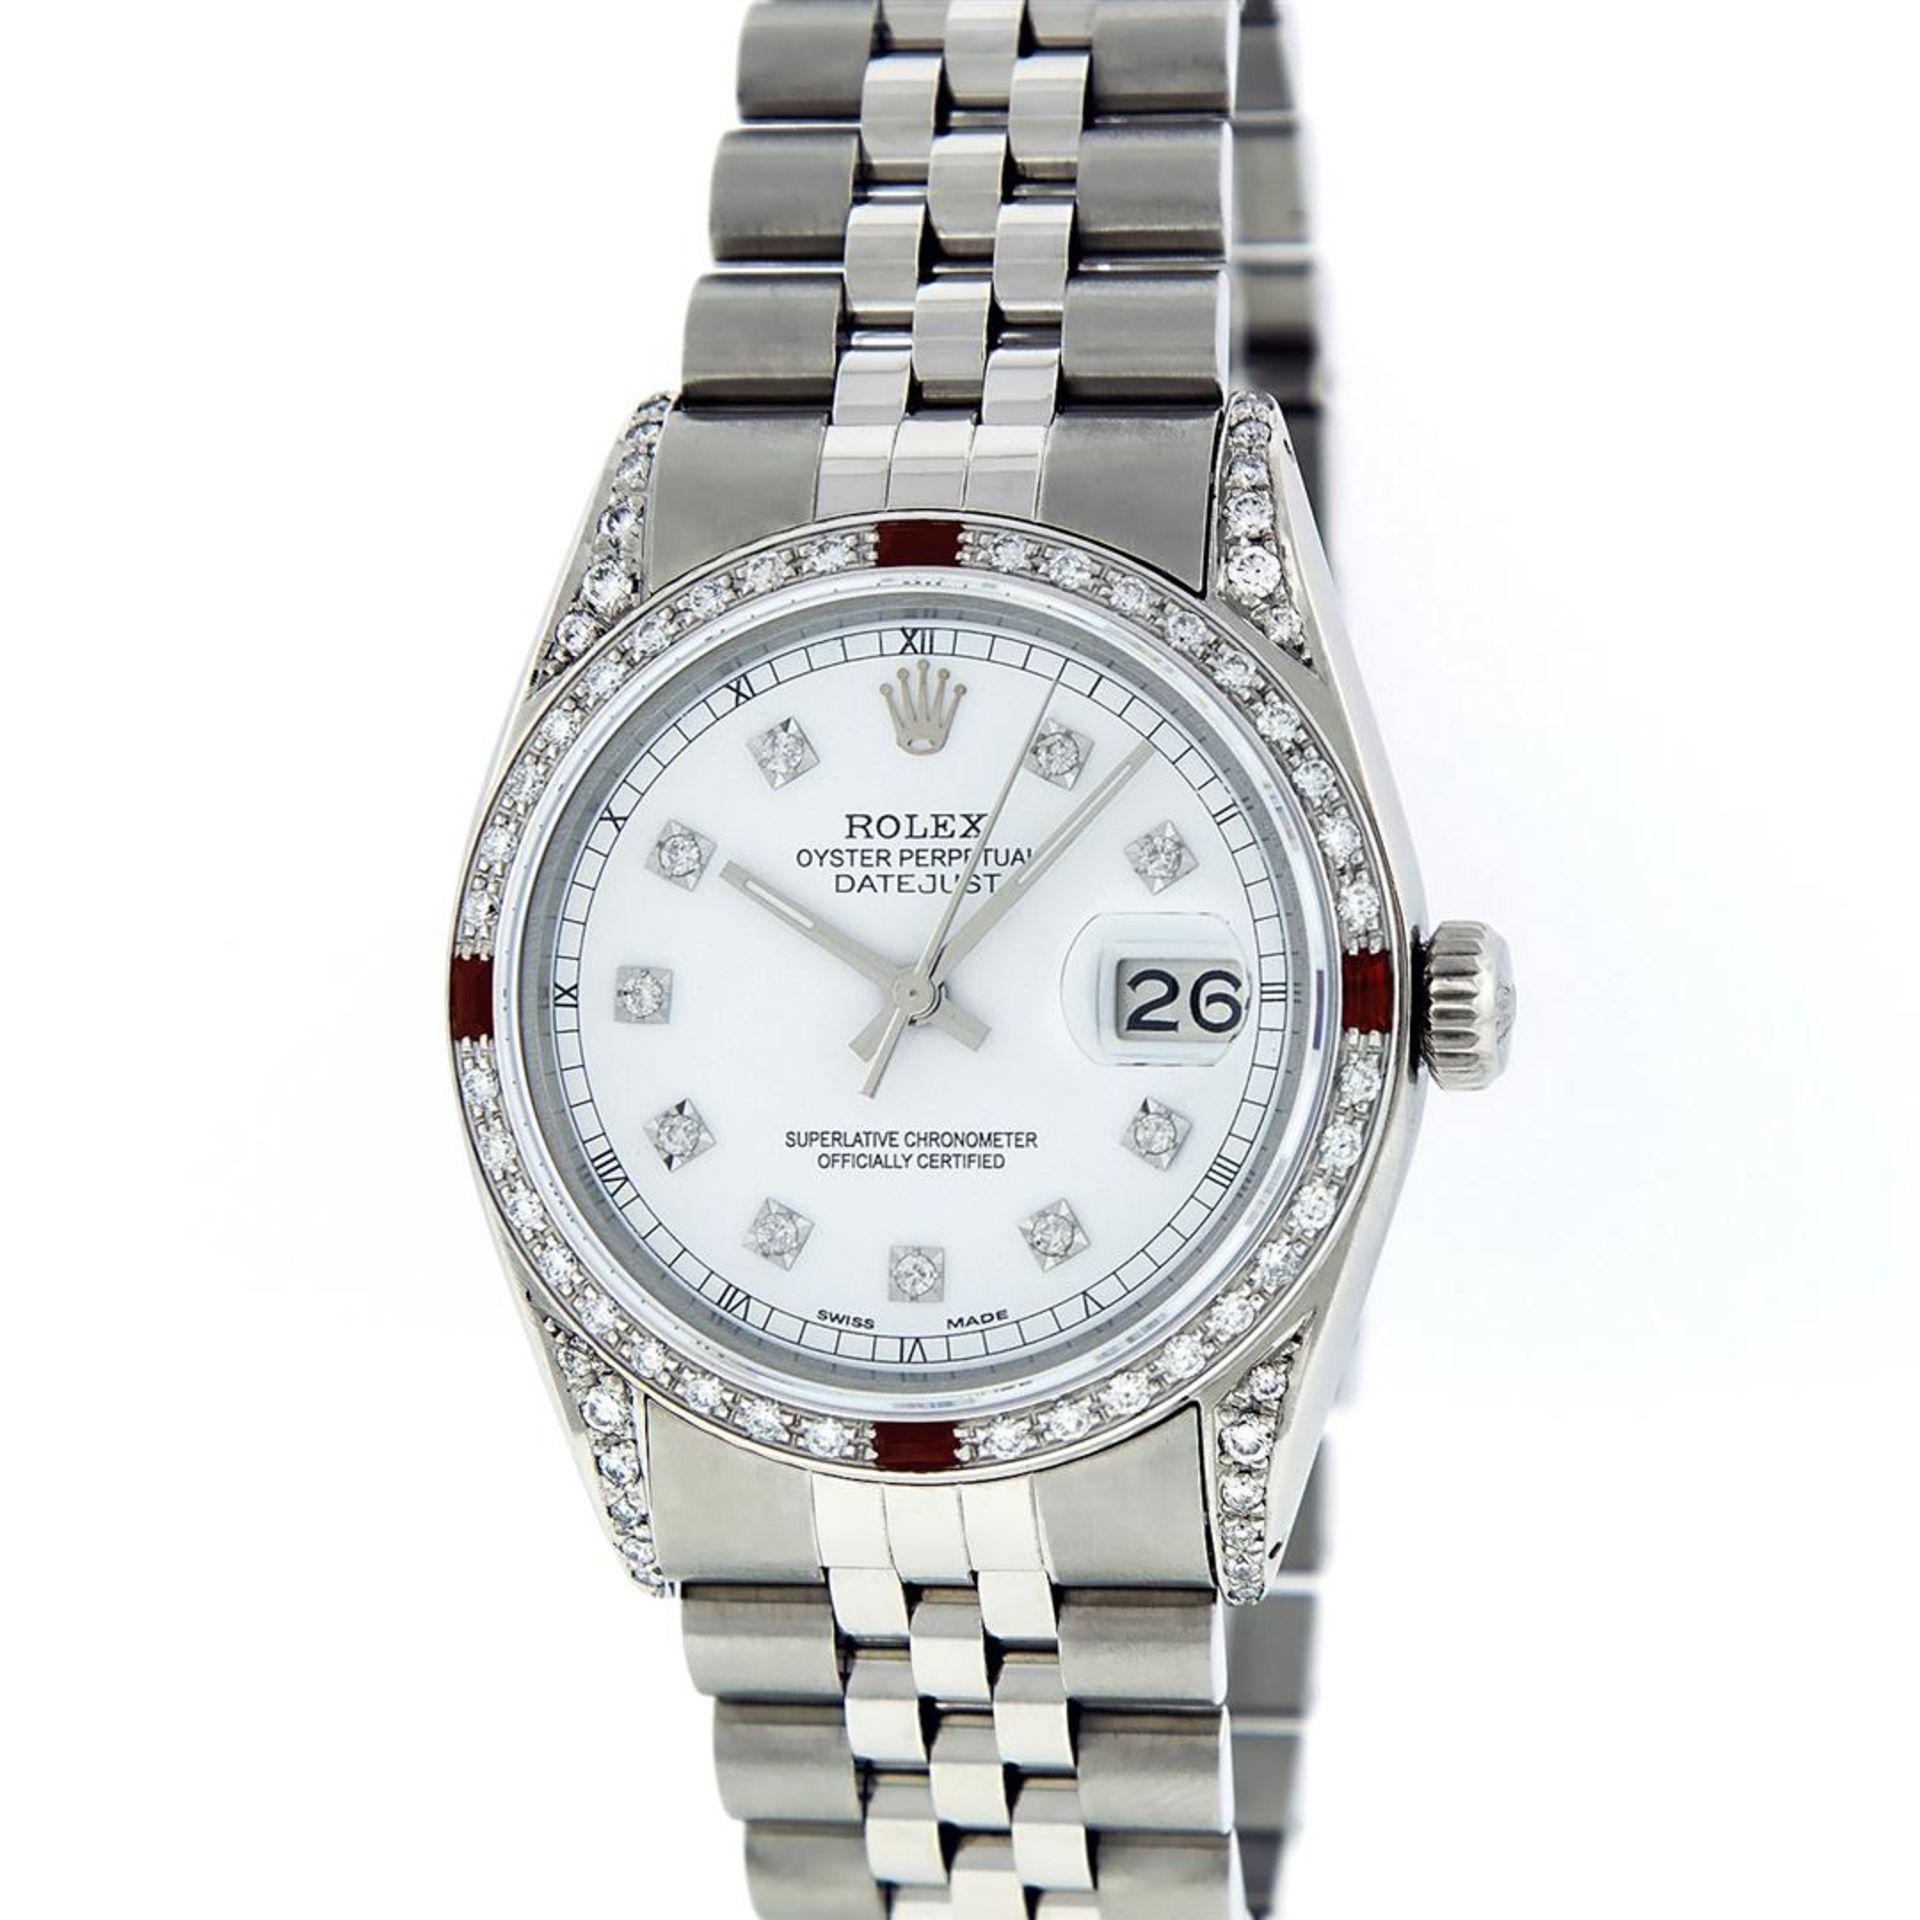 Rolex Mens Stainless Steel Diamond Lugs & Ruby Datejust Wristwatch - Image 2 of 8